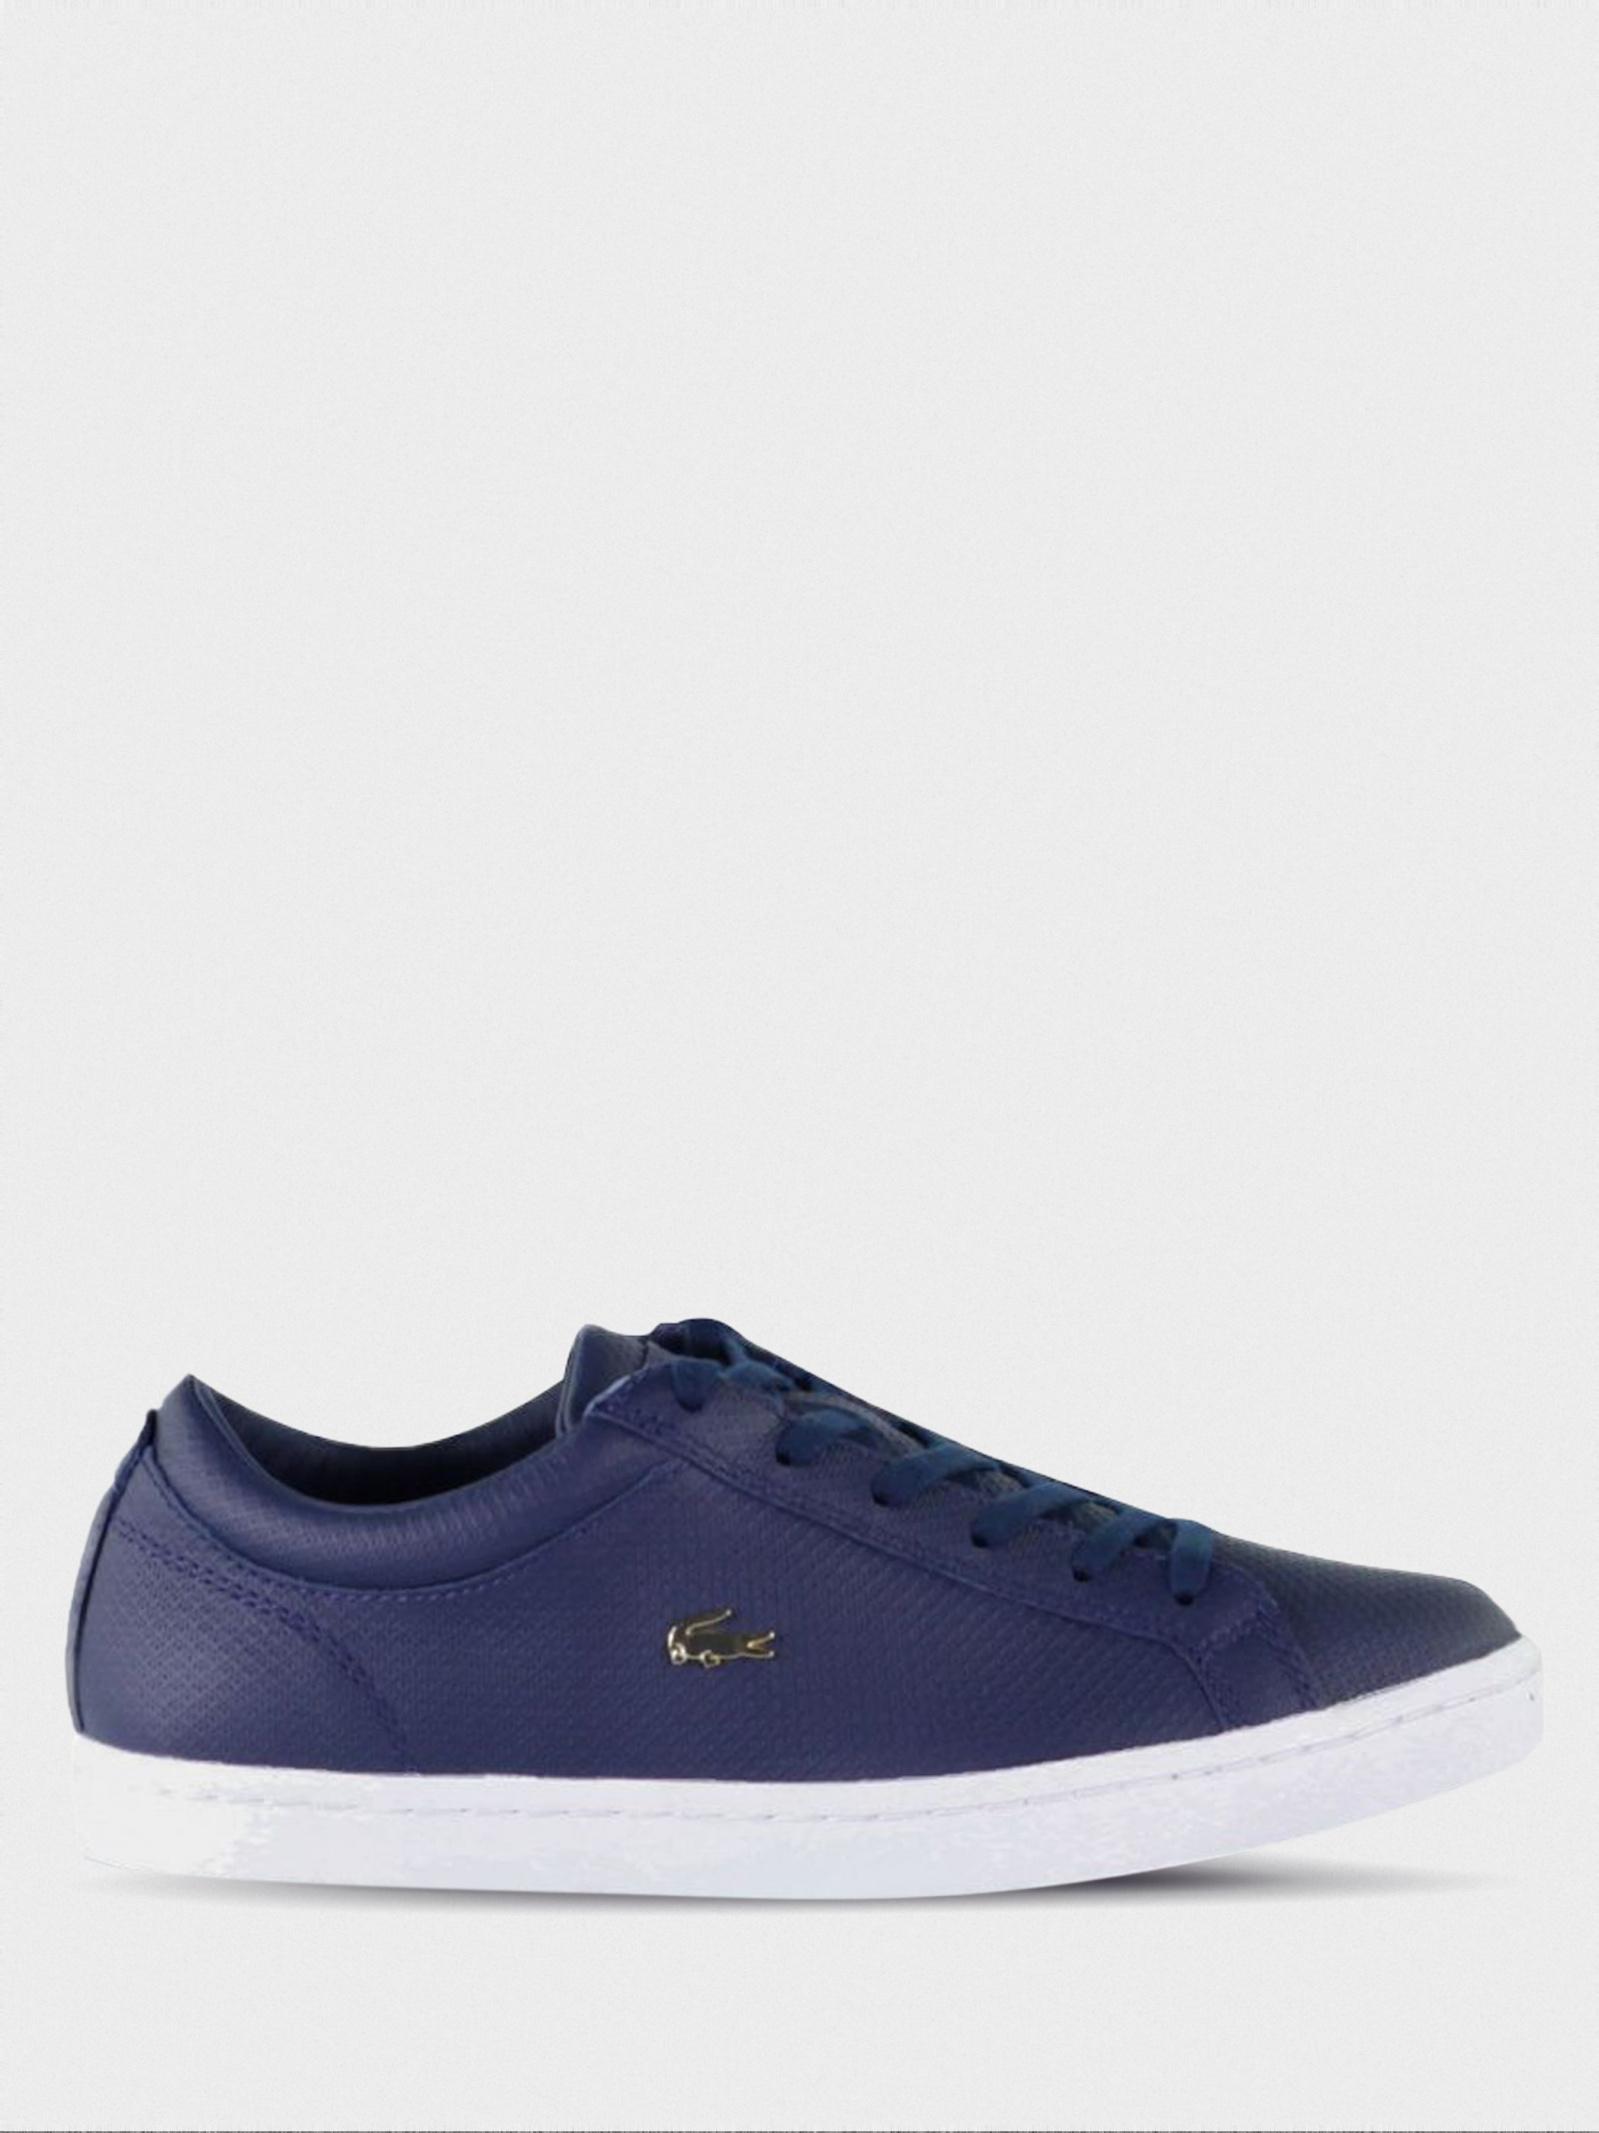 Полуботинки женские Lacoste Straightset 316 3 732CAW0146003 размерная сетка обуви, 2017